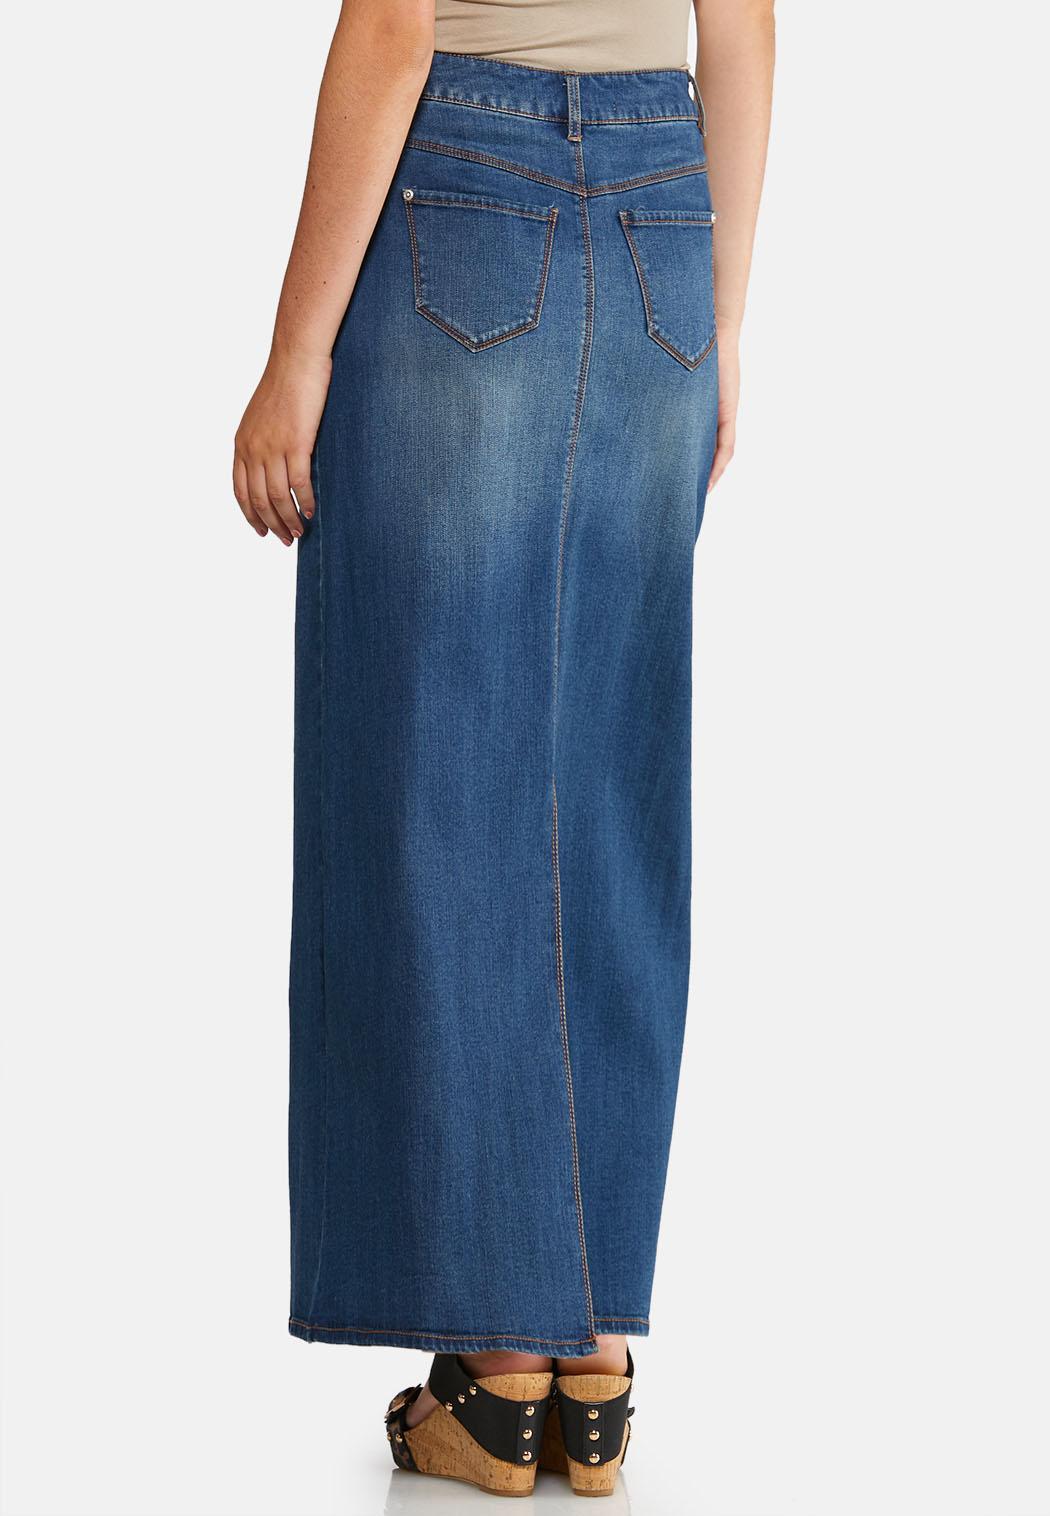 Plus Size Whiskered Denim Maxi Skirt Skirts Cato Fashions